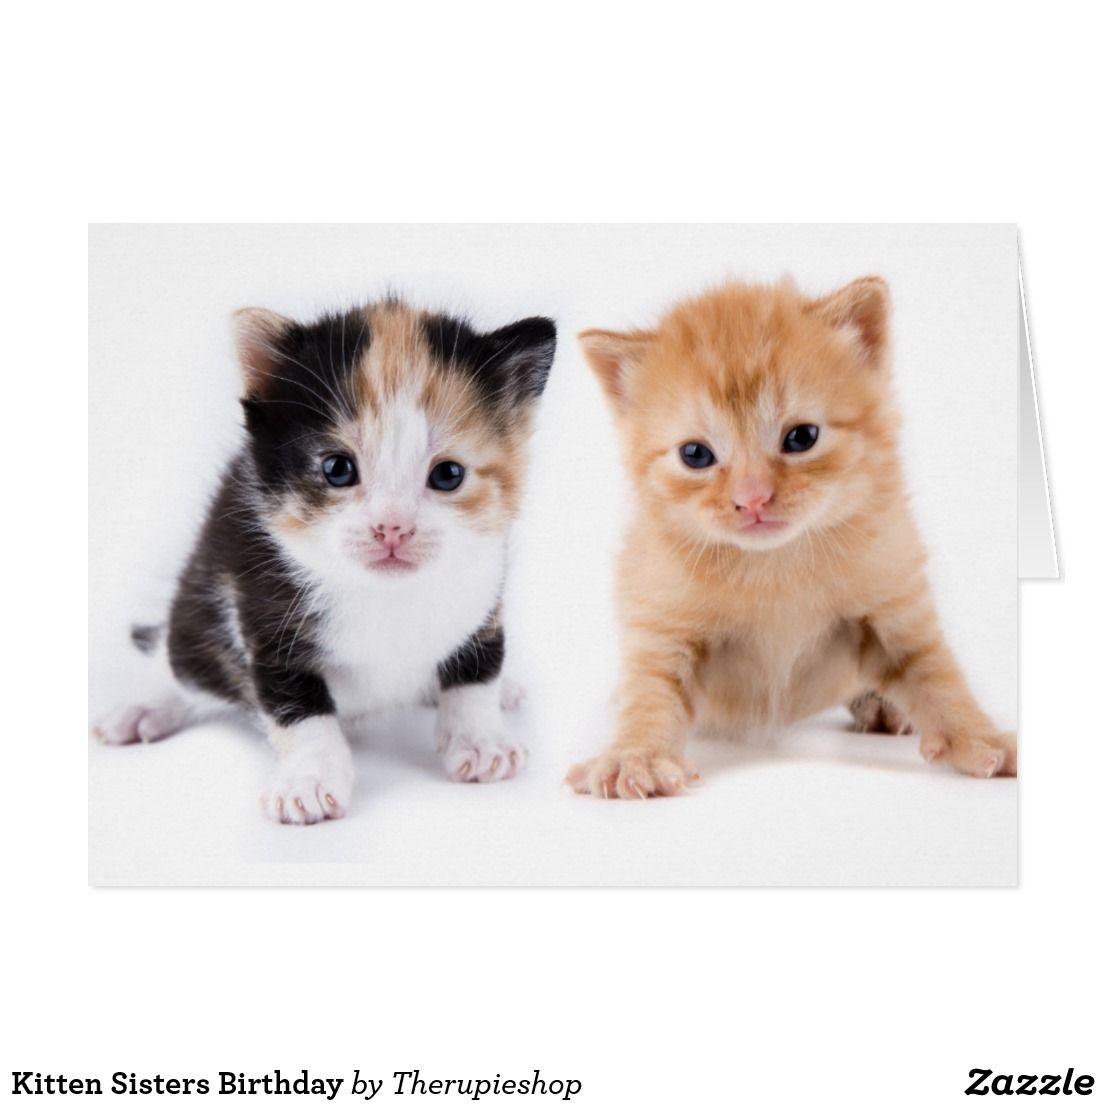 Kitten Sisters Birthday Card Zazzle Com Sister Birthday Card Cat Birthday Card Baby Cats